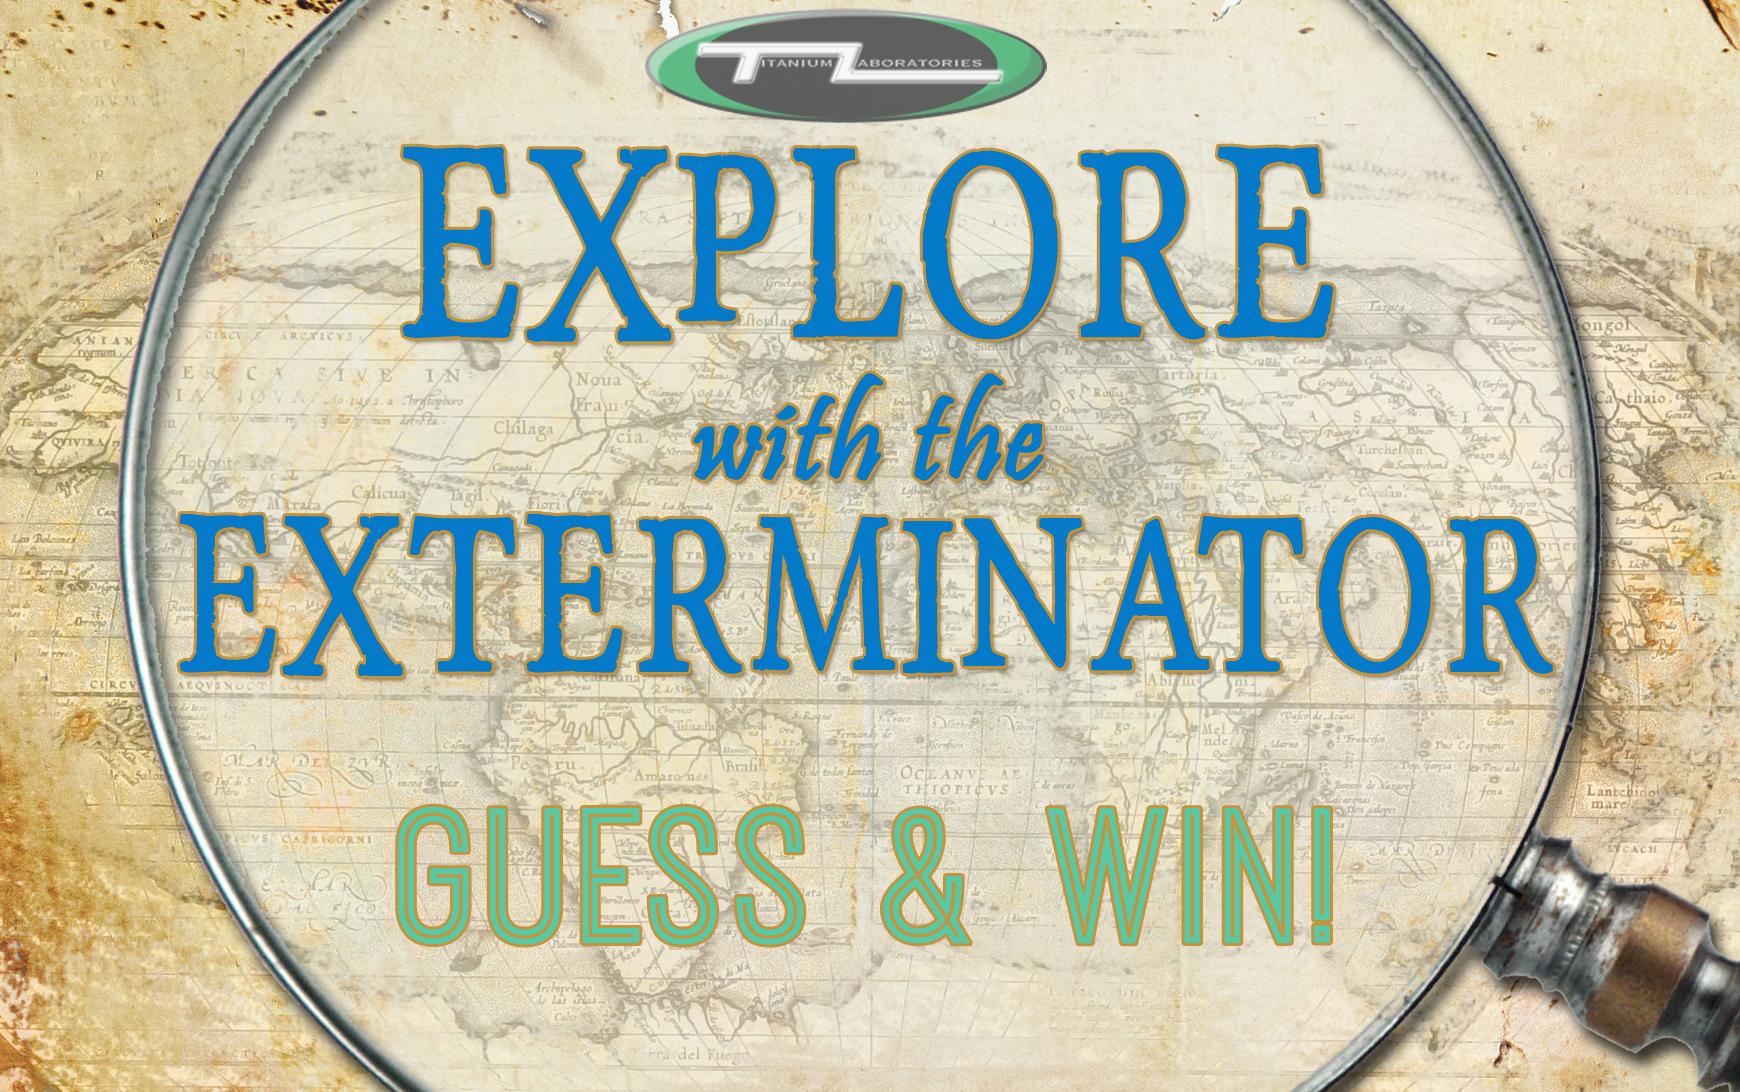 Explore with the Exterminator